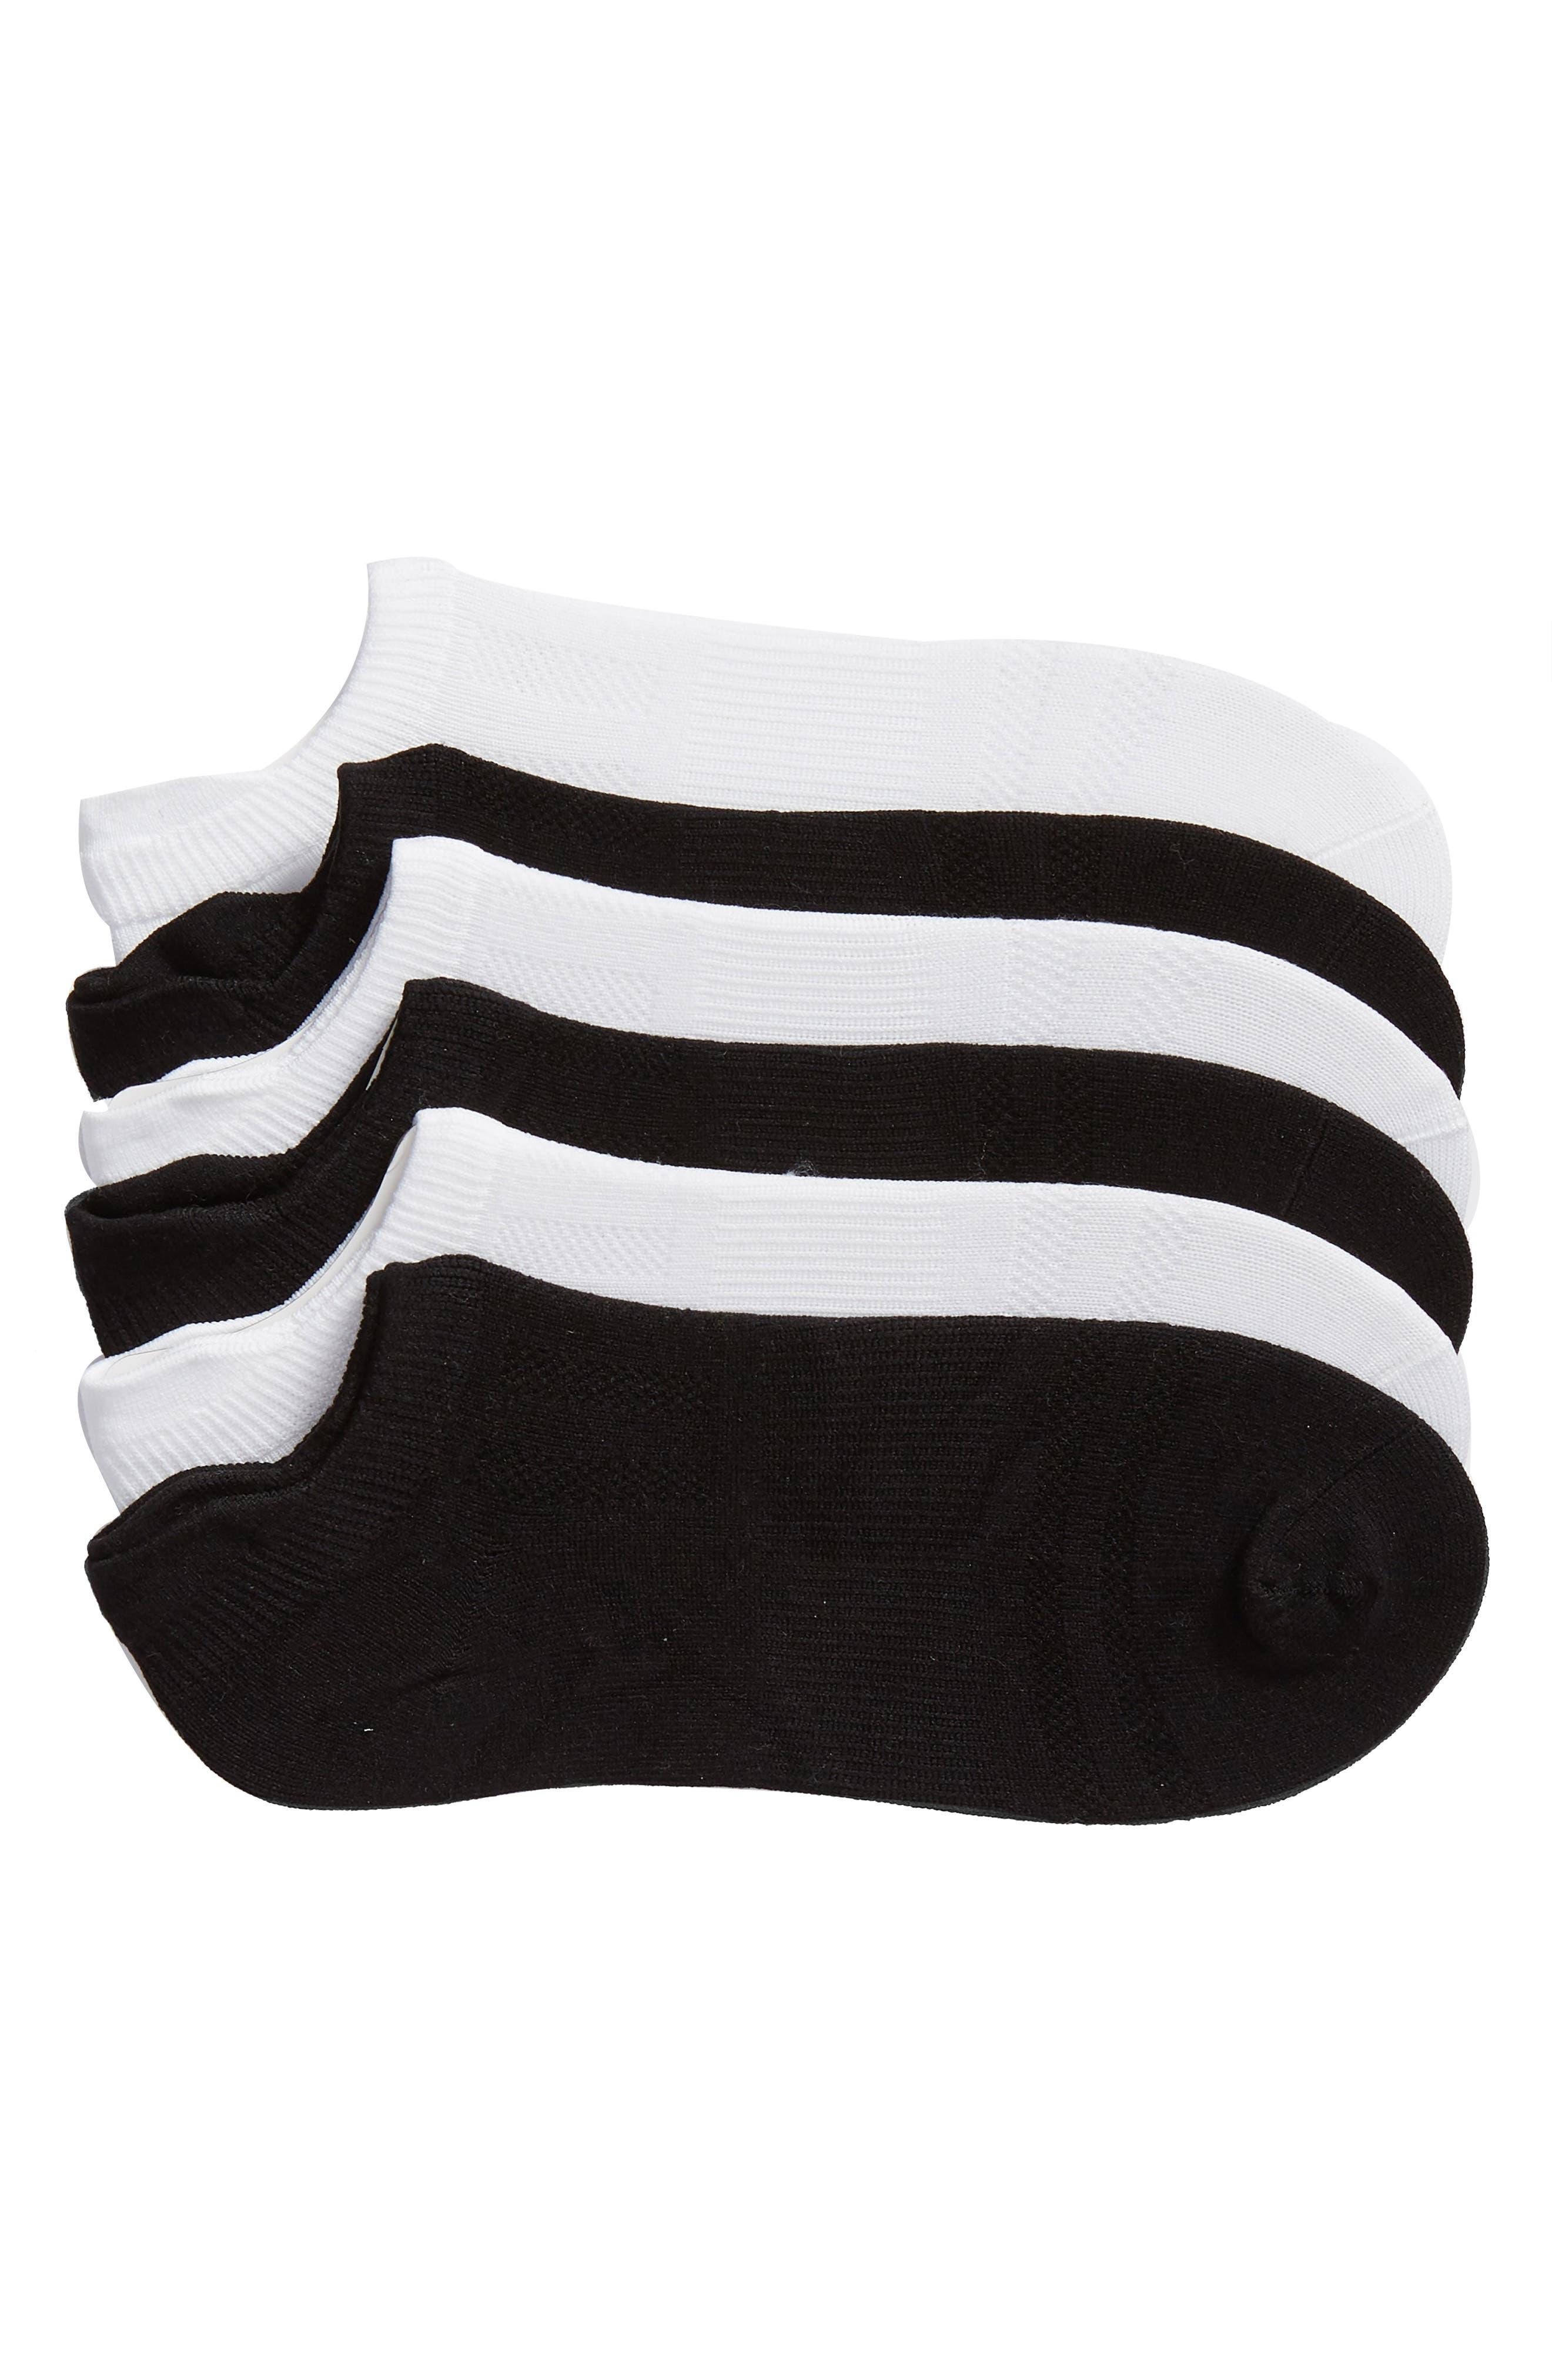 SOF SOLE, 6-Pack Low Cut Socks, Main thumbnail 1, color, WHITE/ BLACK